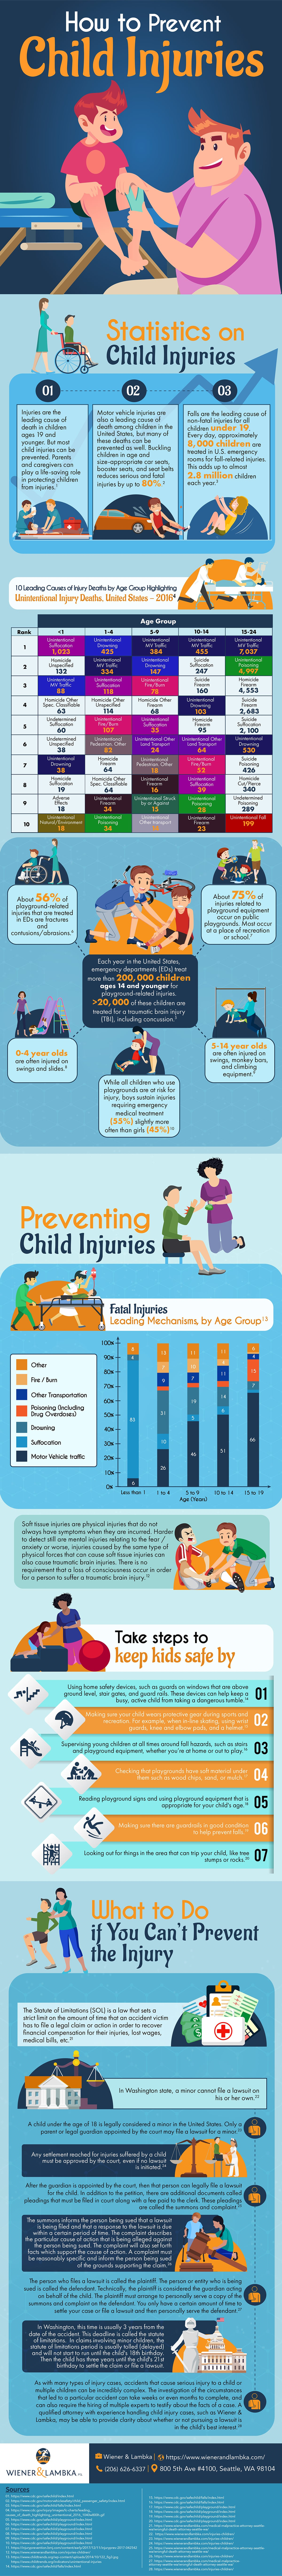 Preventing Child Injuries